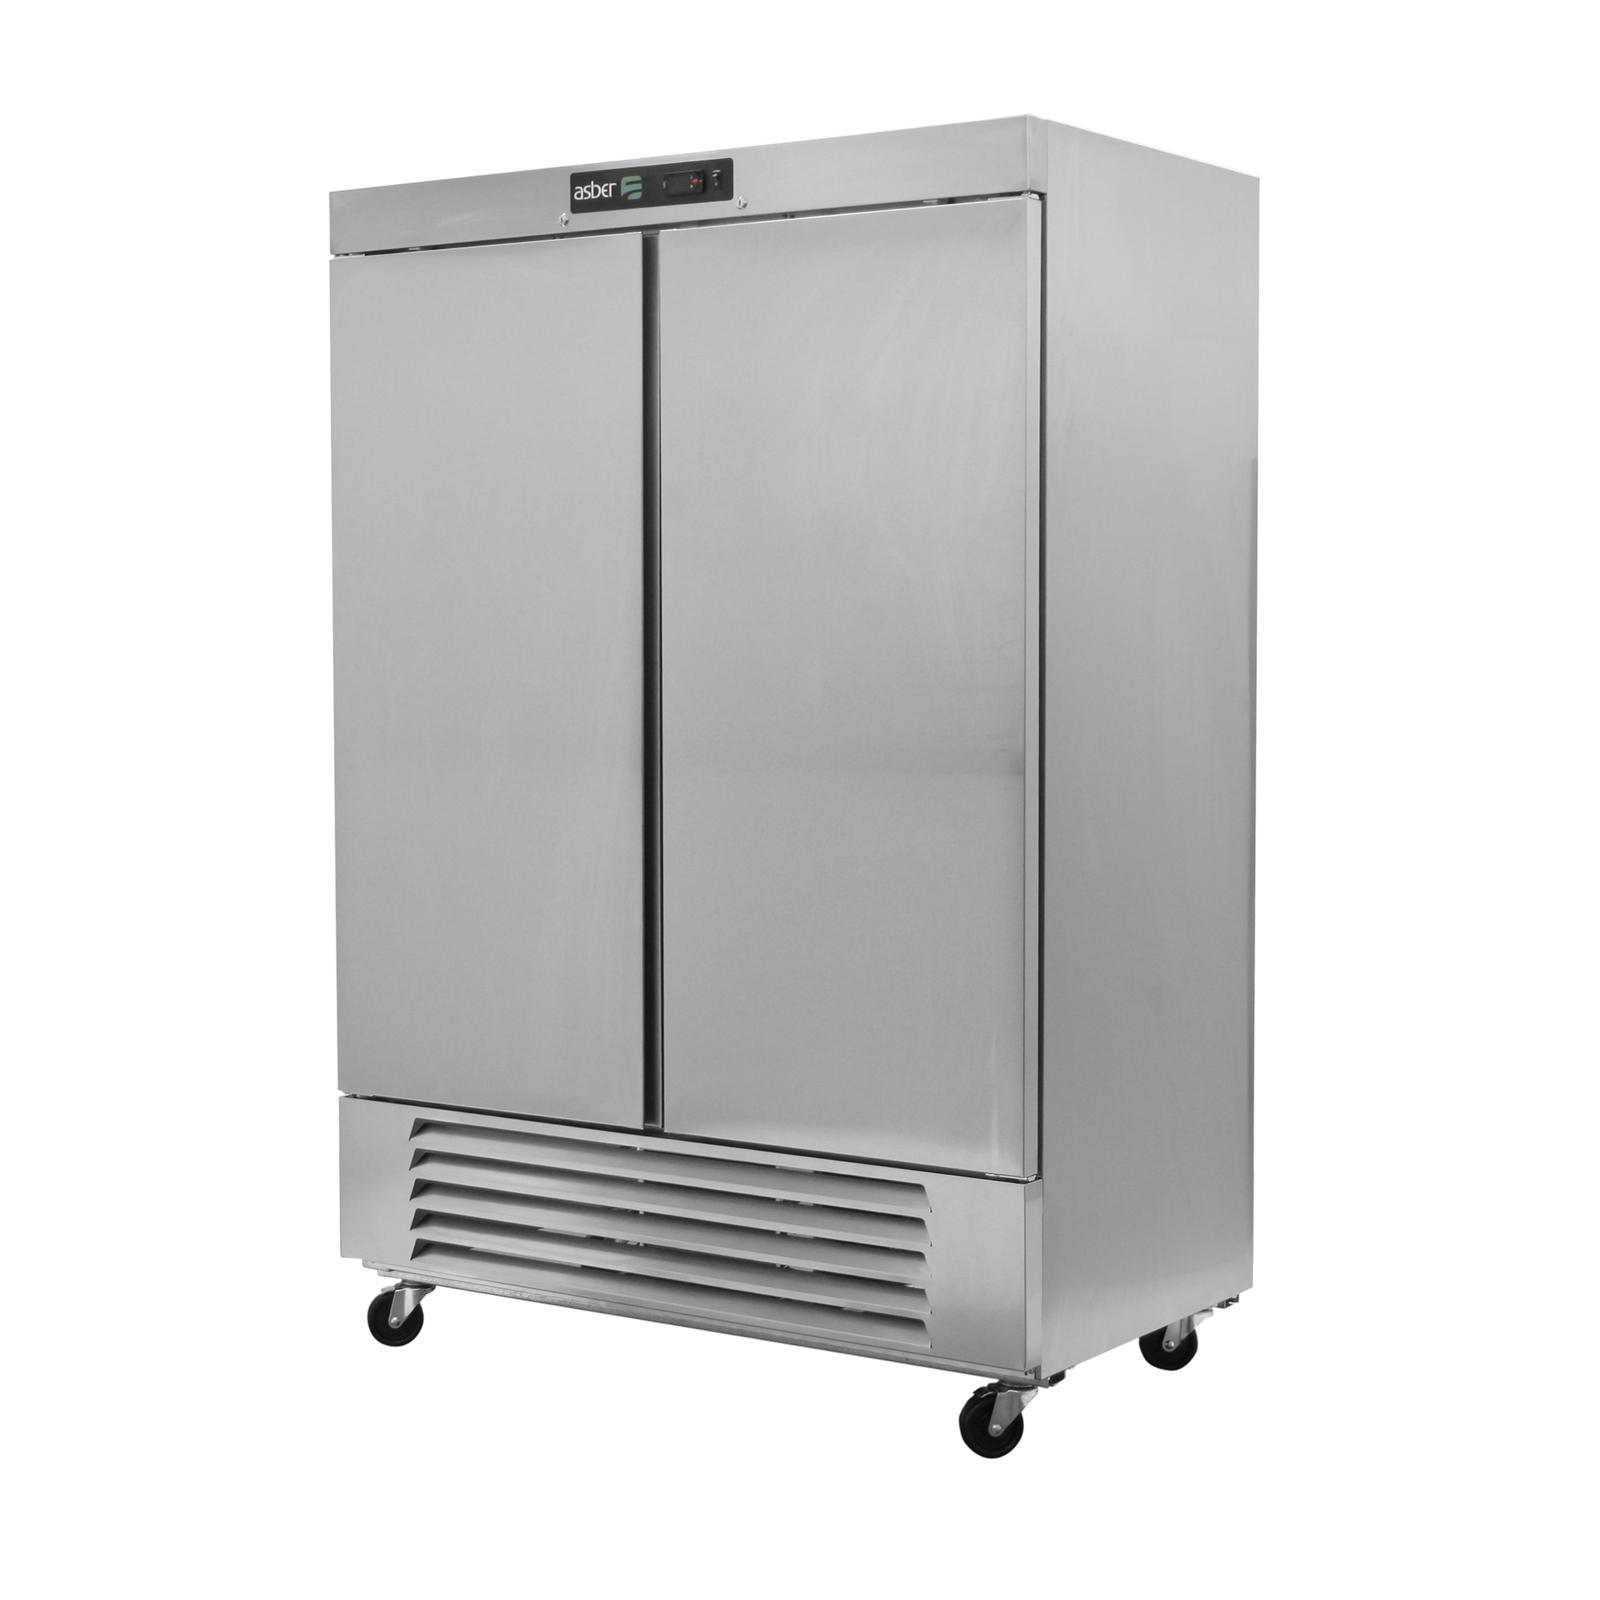 ARR-49 Asber refrigerator, reach-in